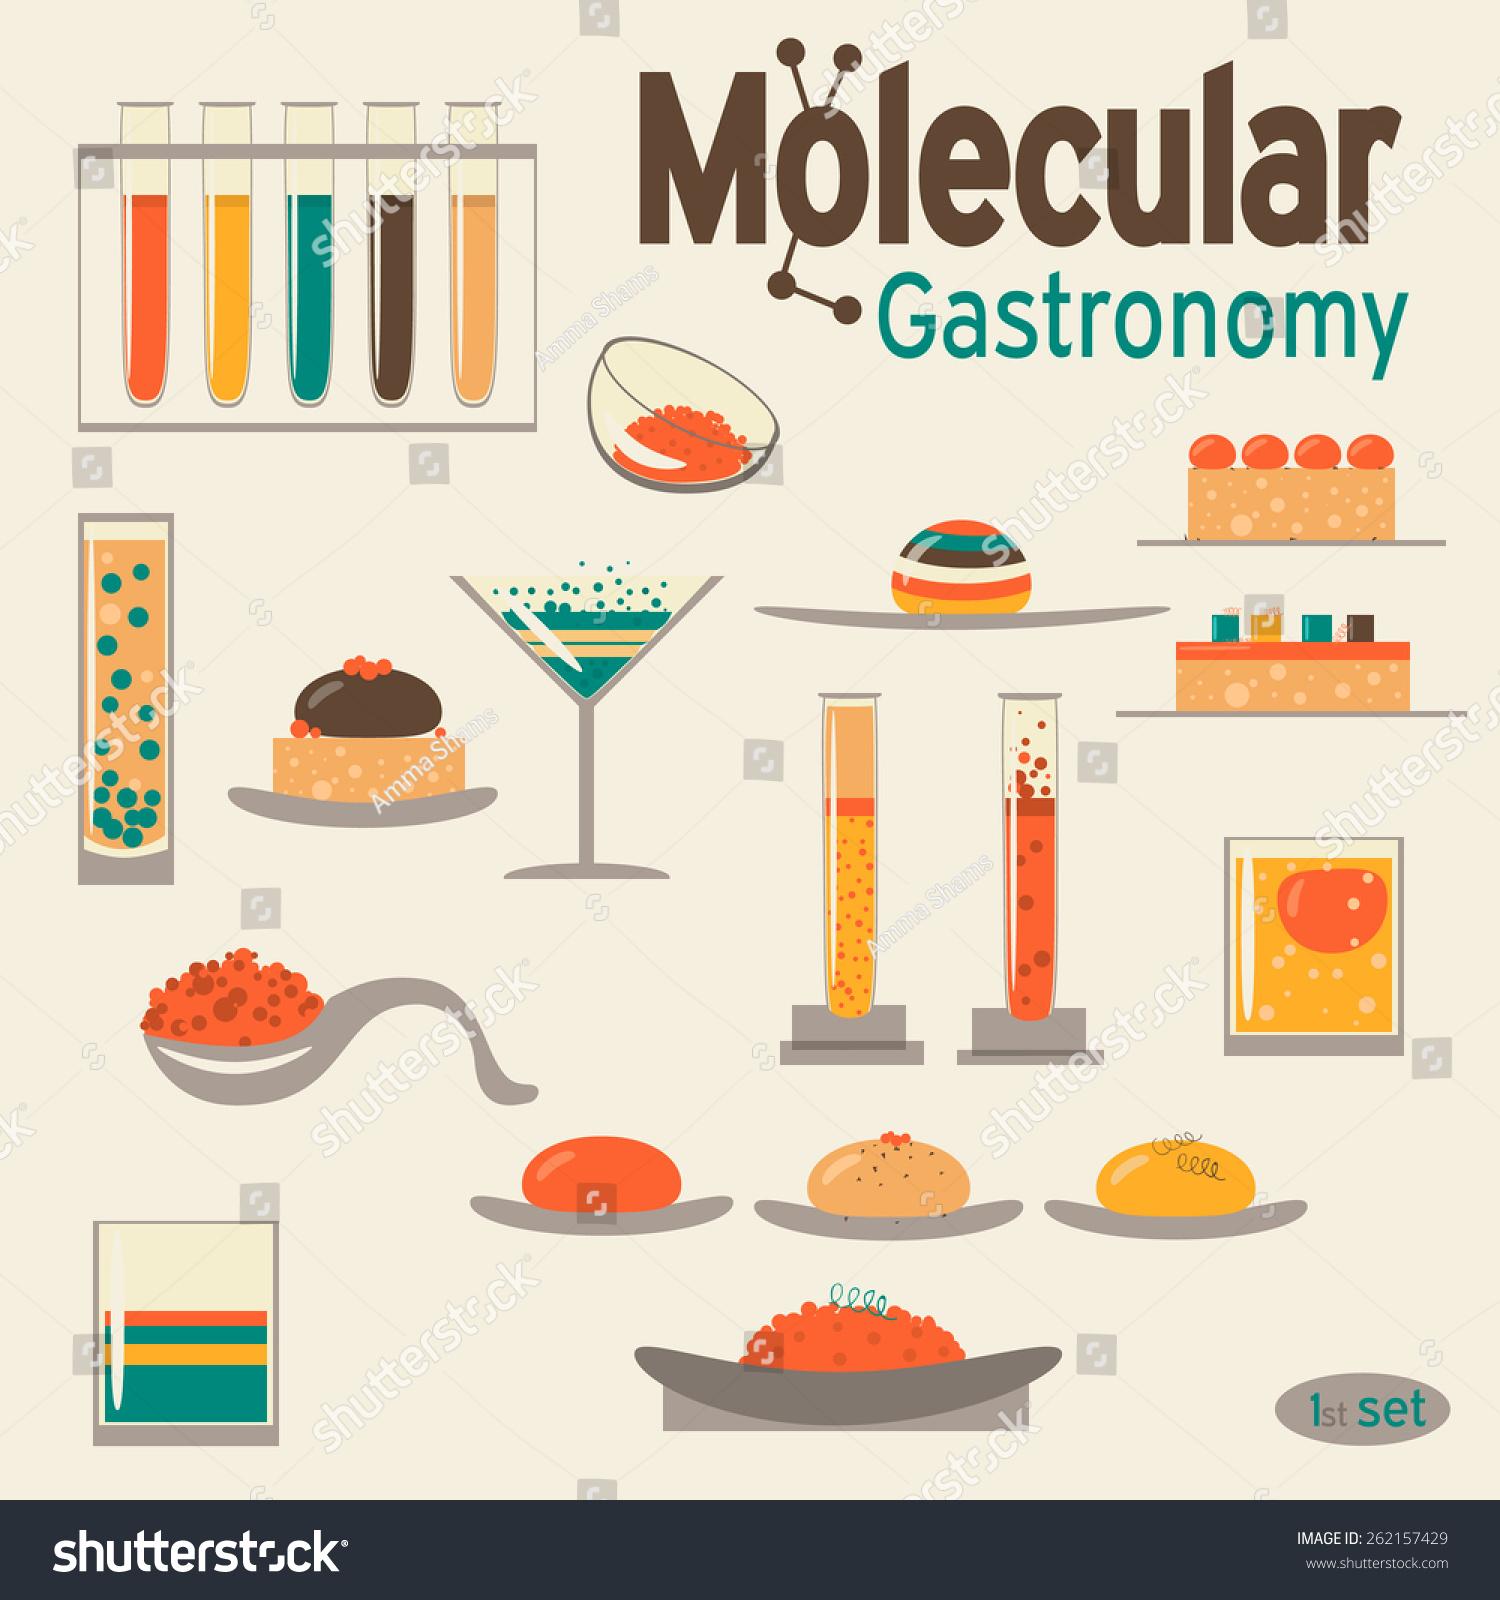 Molecular Gastronomy 2 Set. Vector Flat Design. In Retro Colors. - 262157429 : Shutterstock